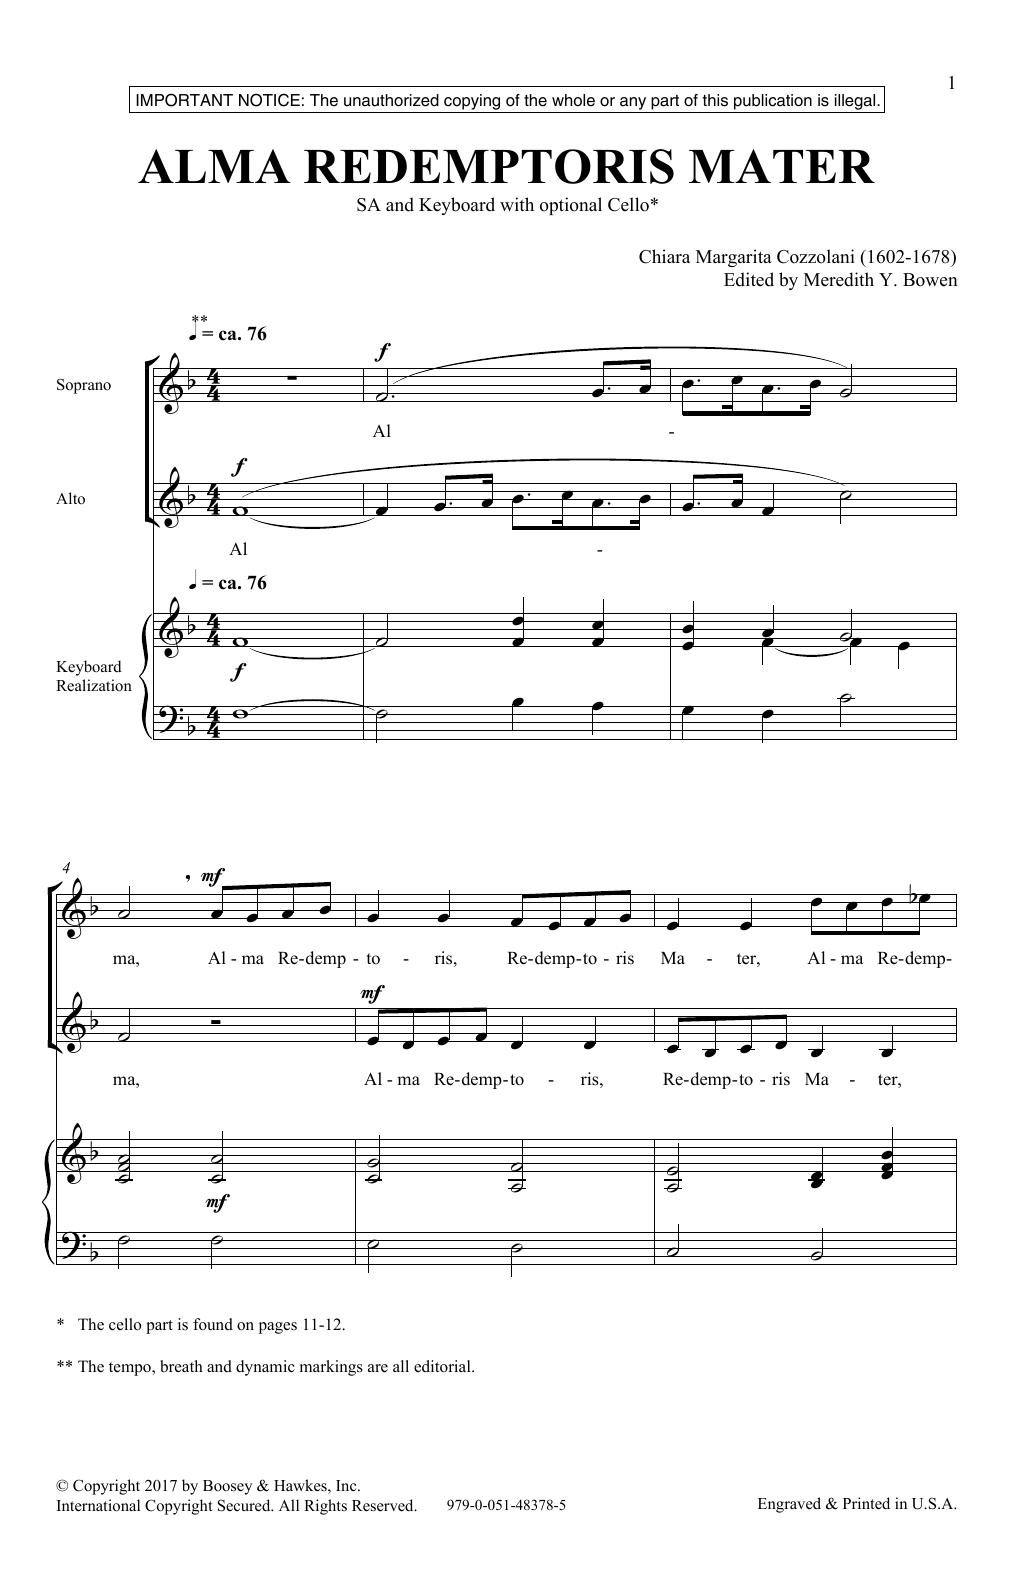 Alma Redemptoris Mater Sheet Music